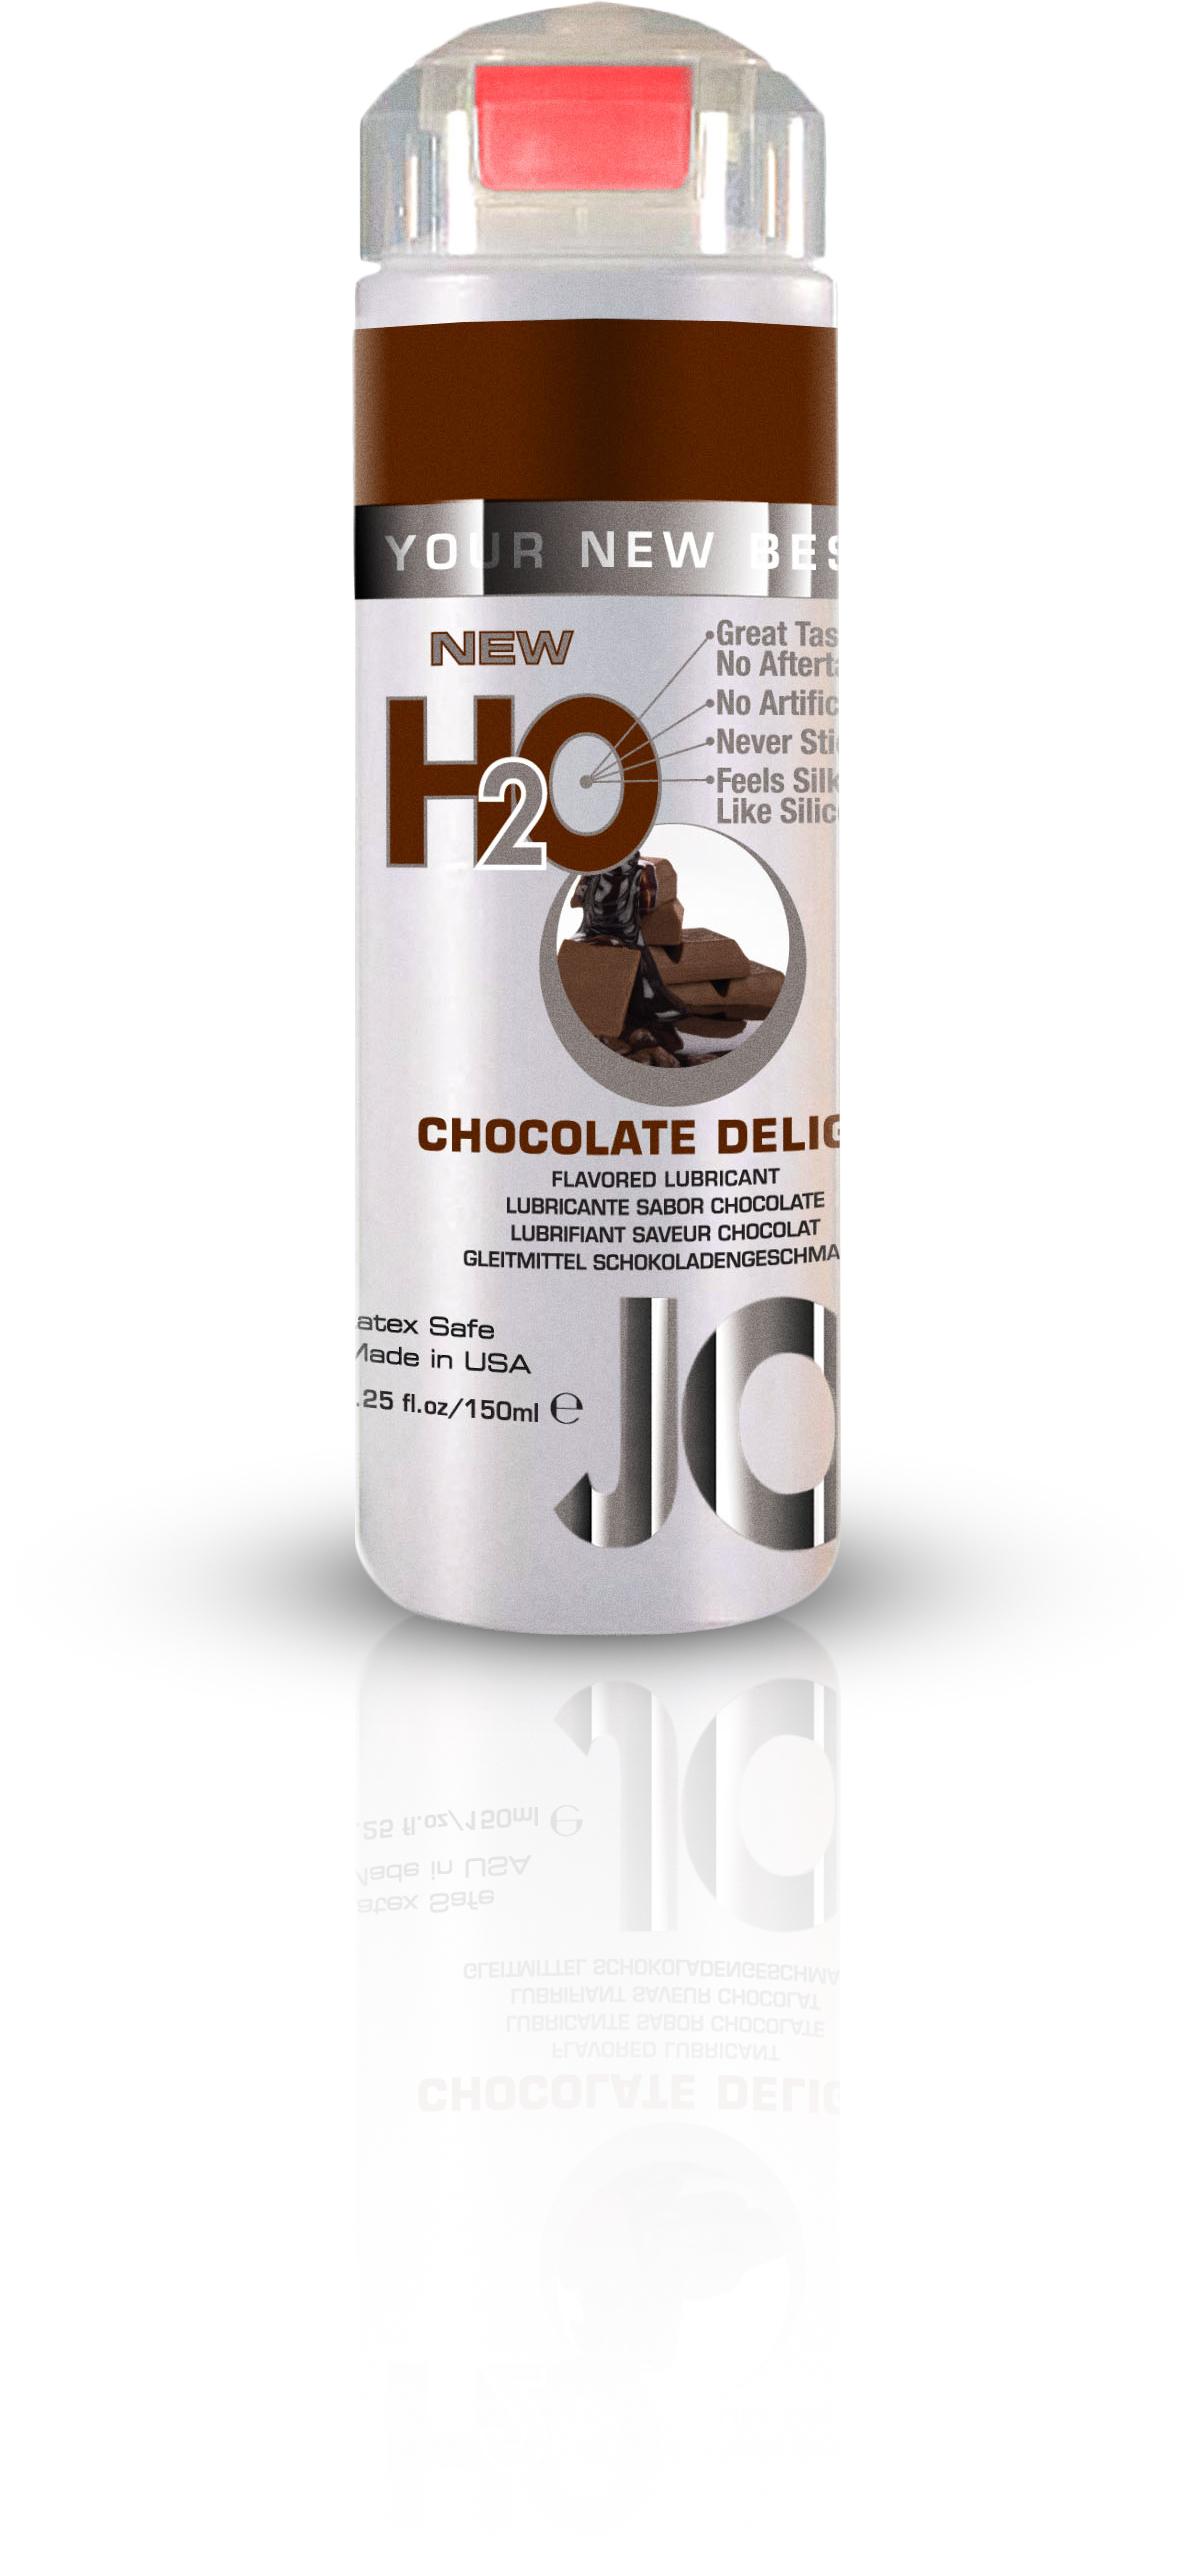 40174_JO_flavored_5.25oz_chocolate.jpg